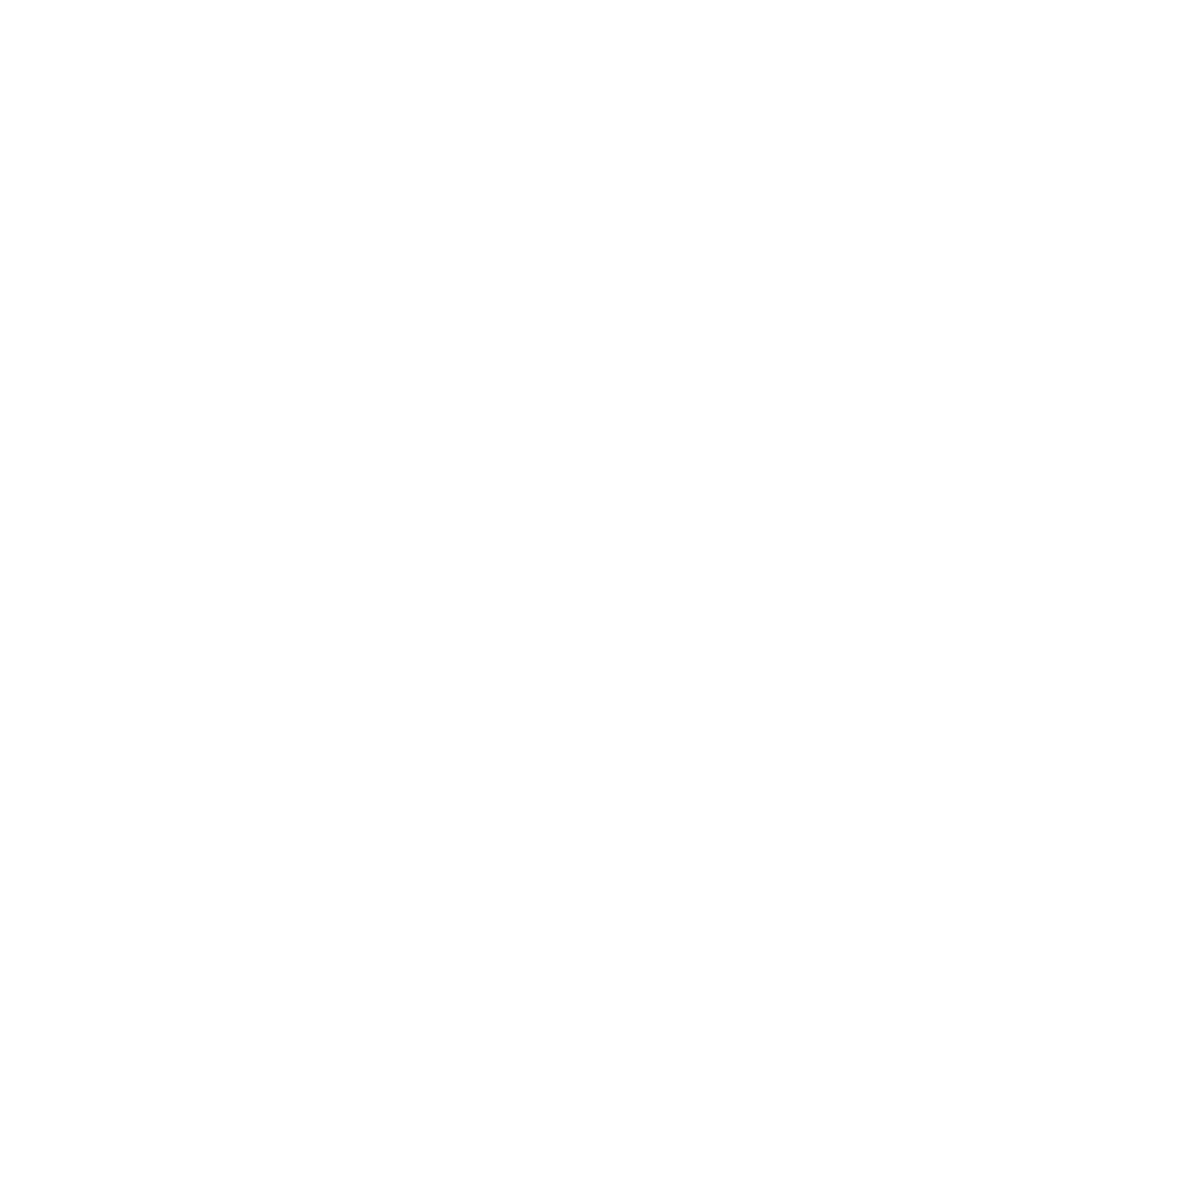 ACBVI alaska center for blind and visually impaired